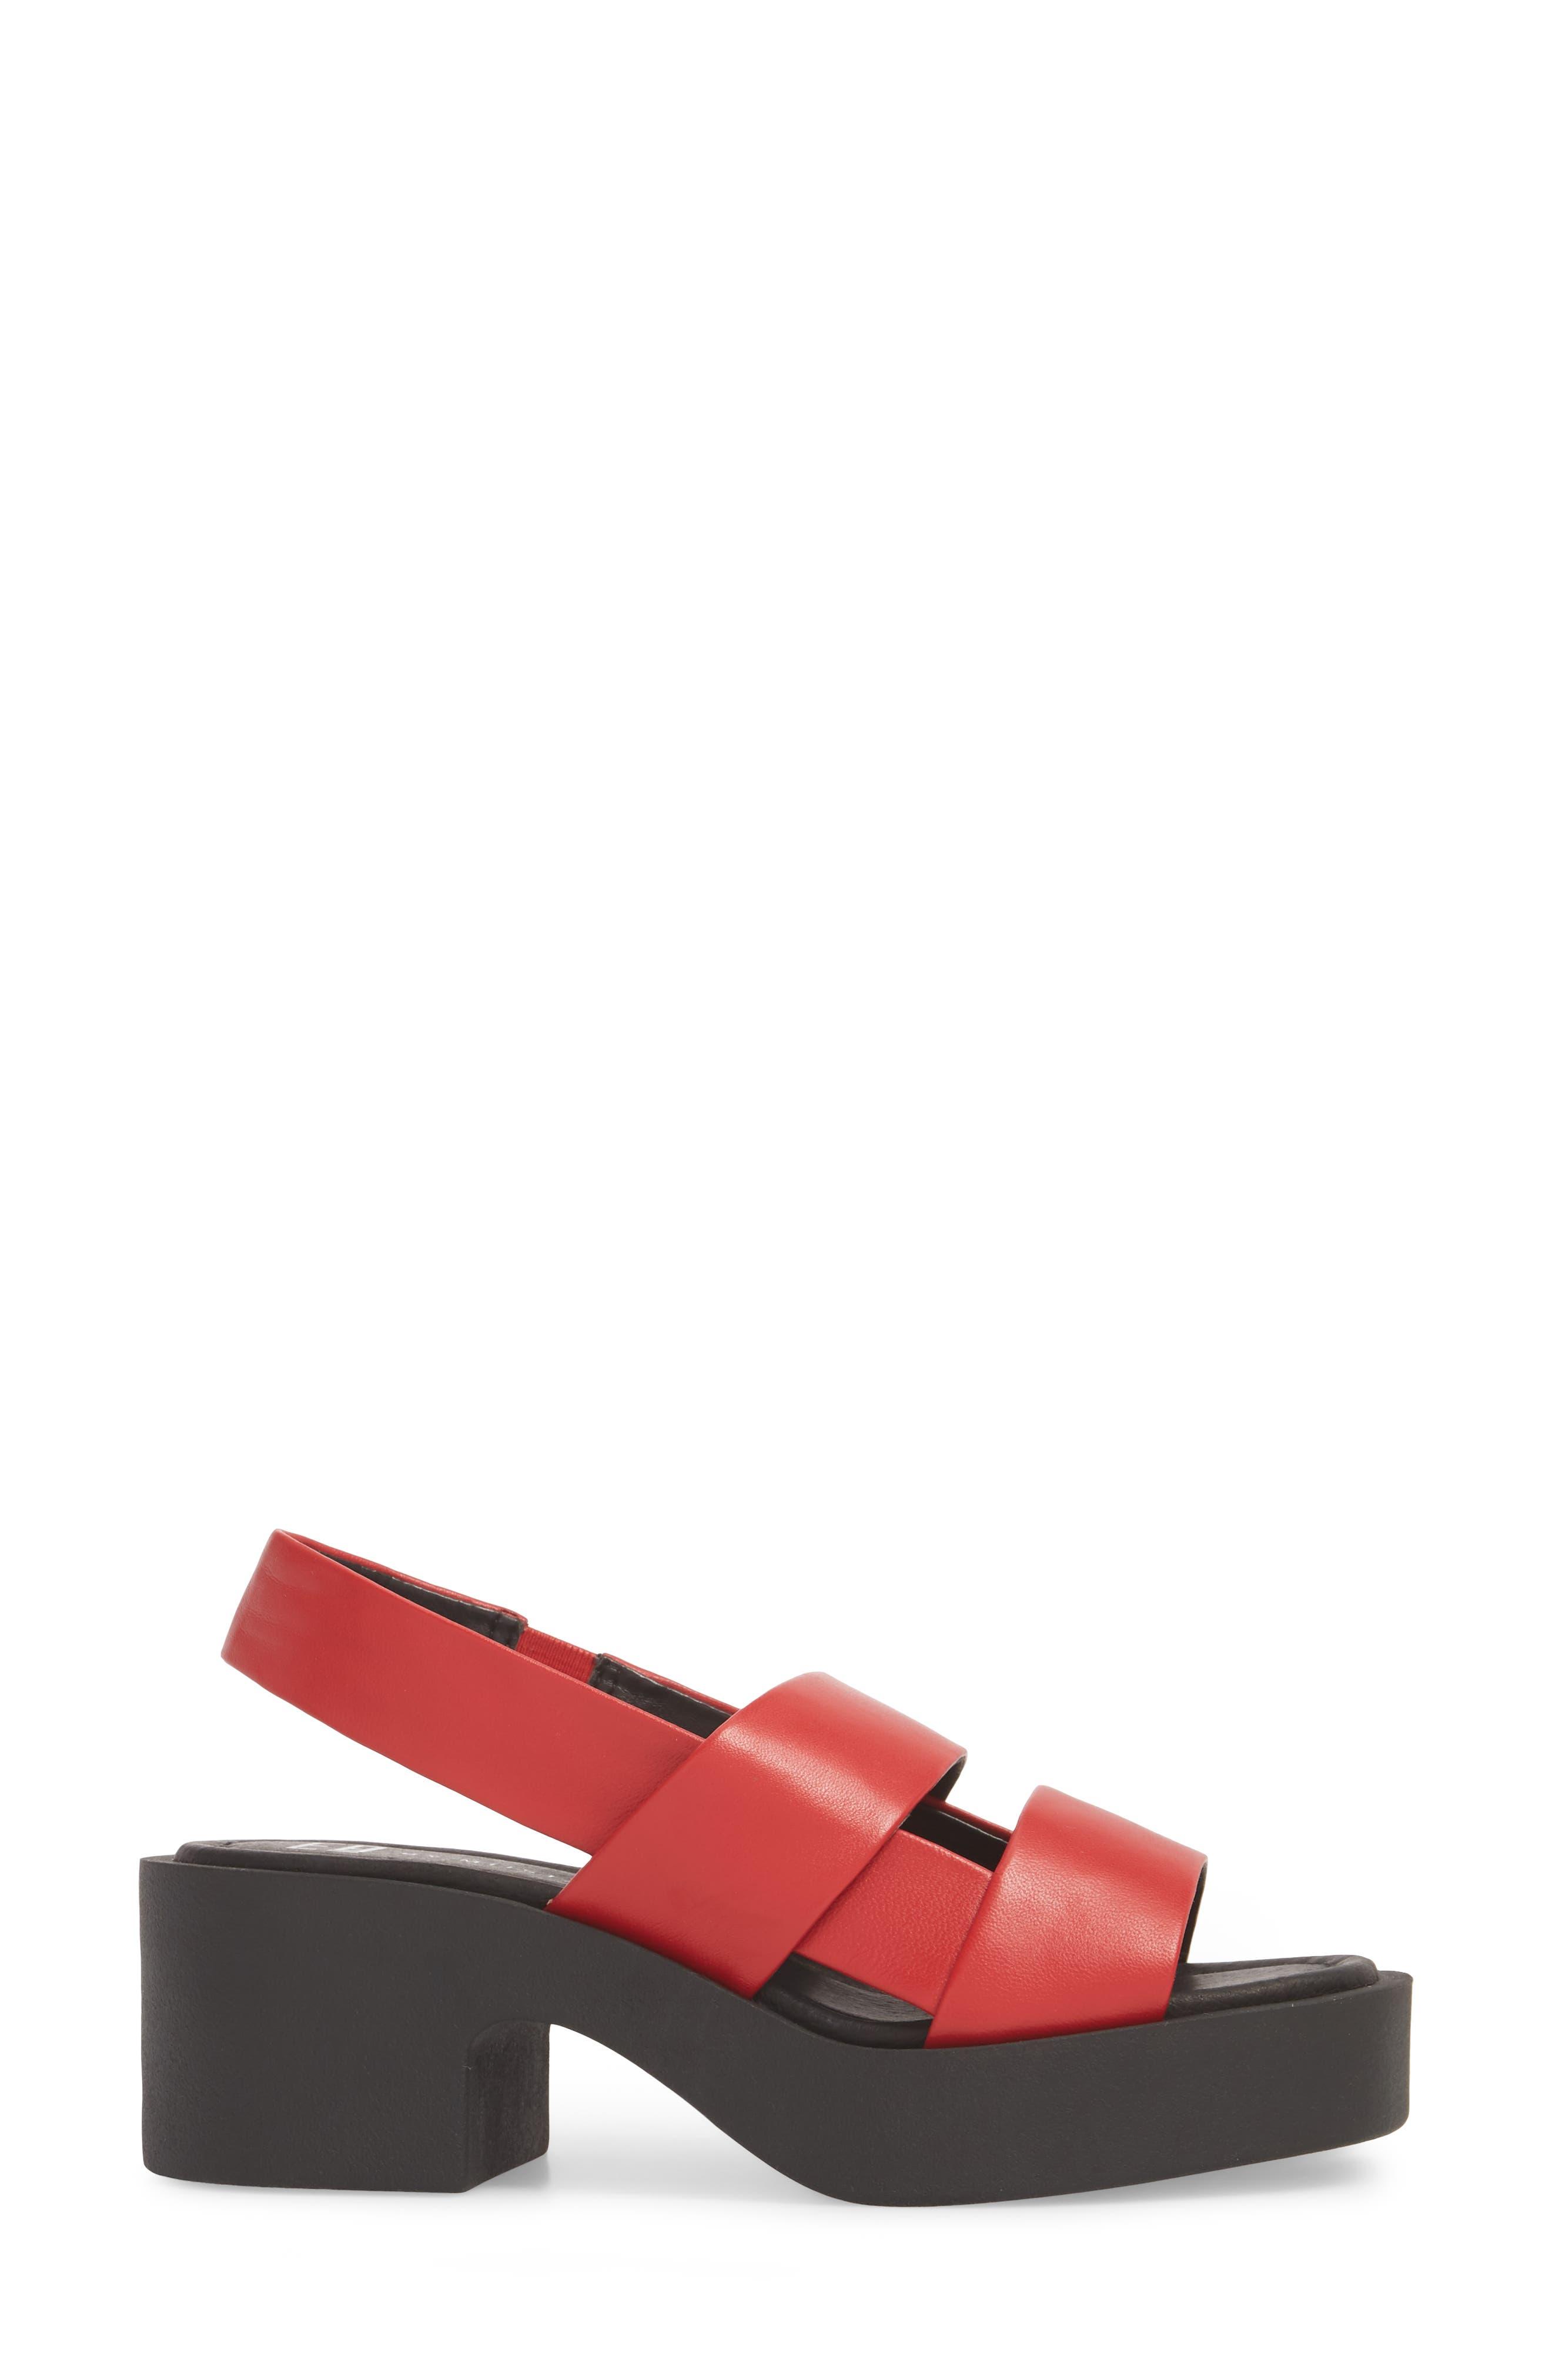 Hazel Slingback Sandal,                             Alternate thumbnail 3, color,                             Red Leather